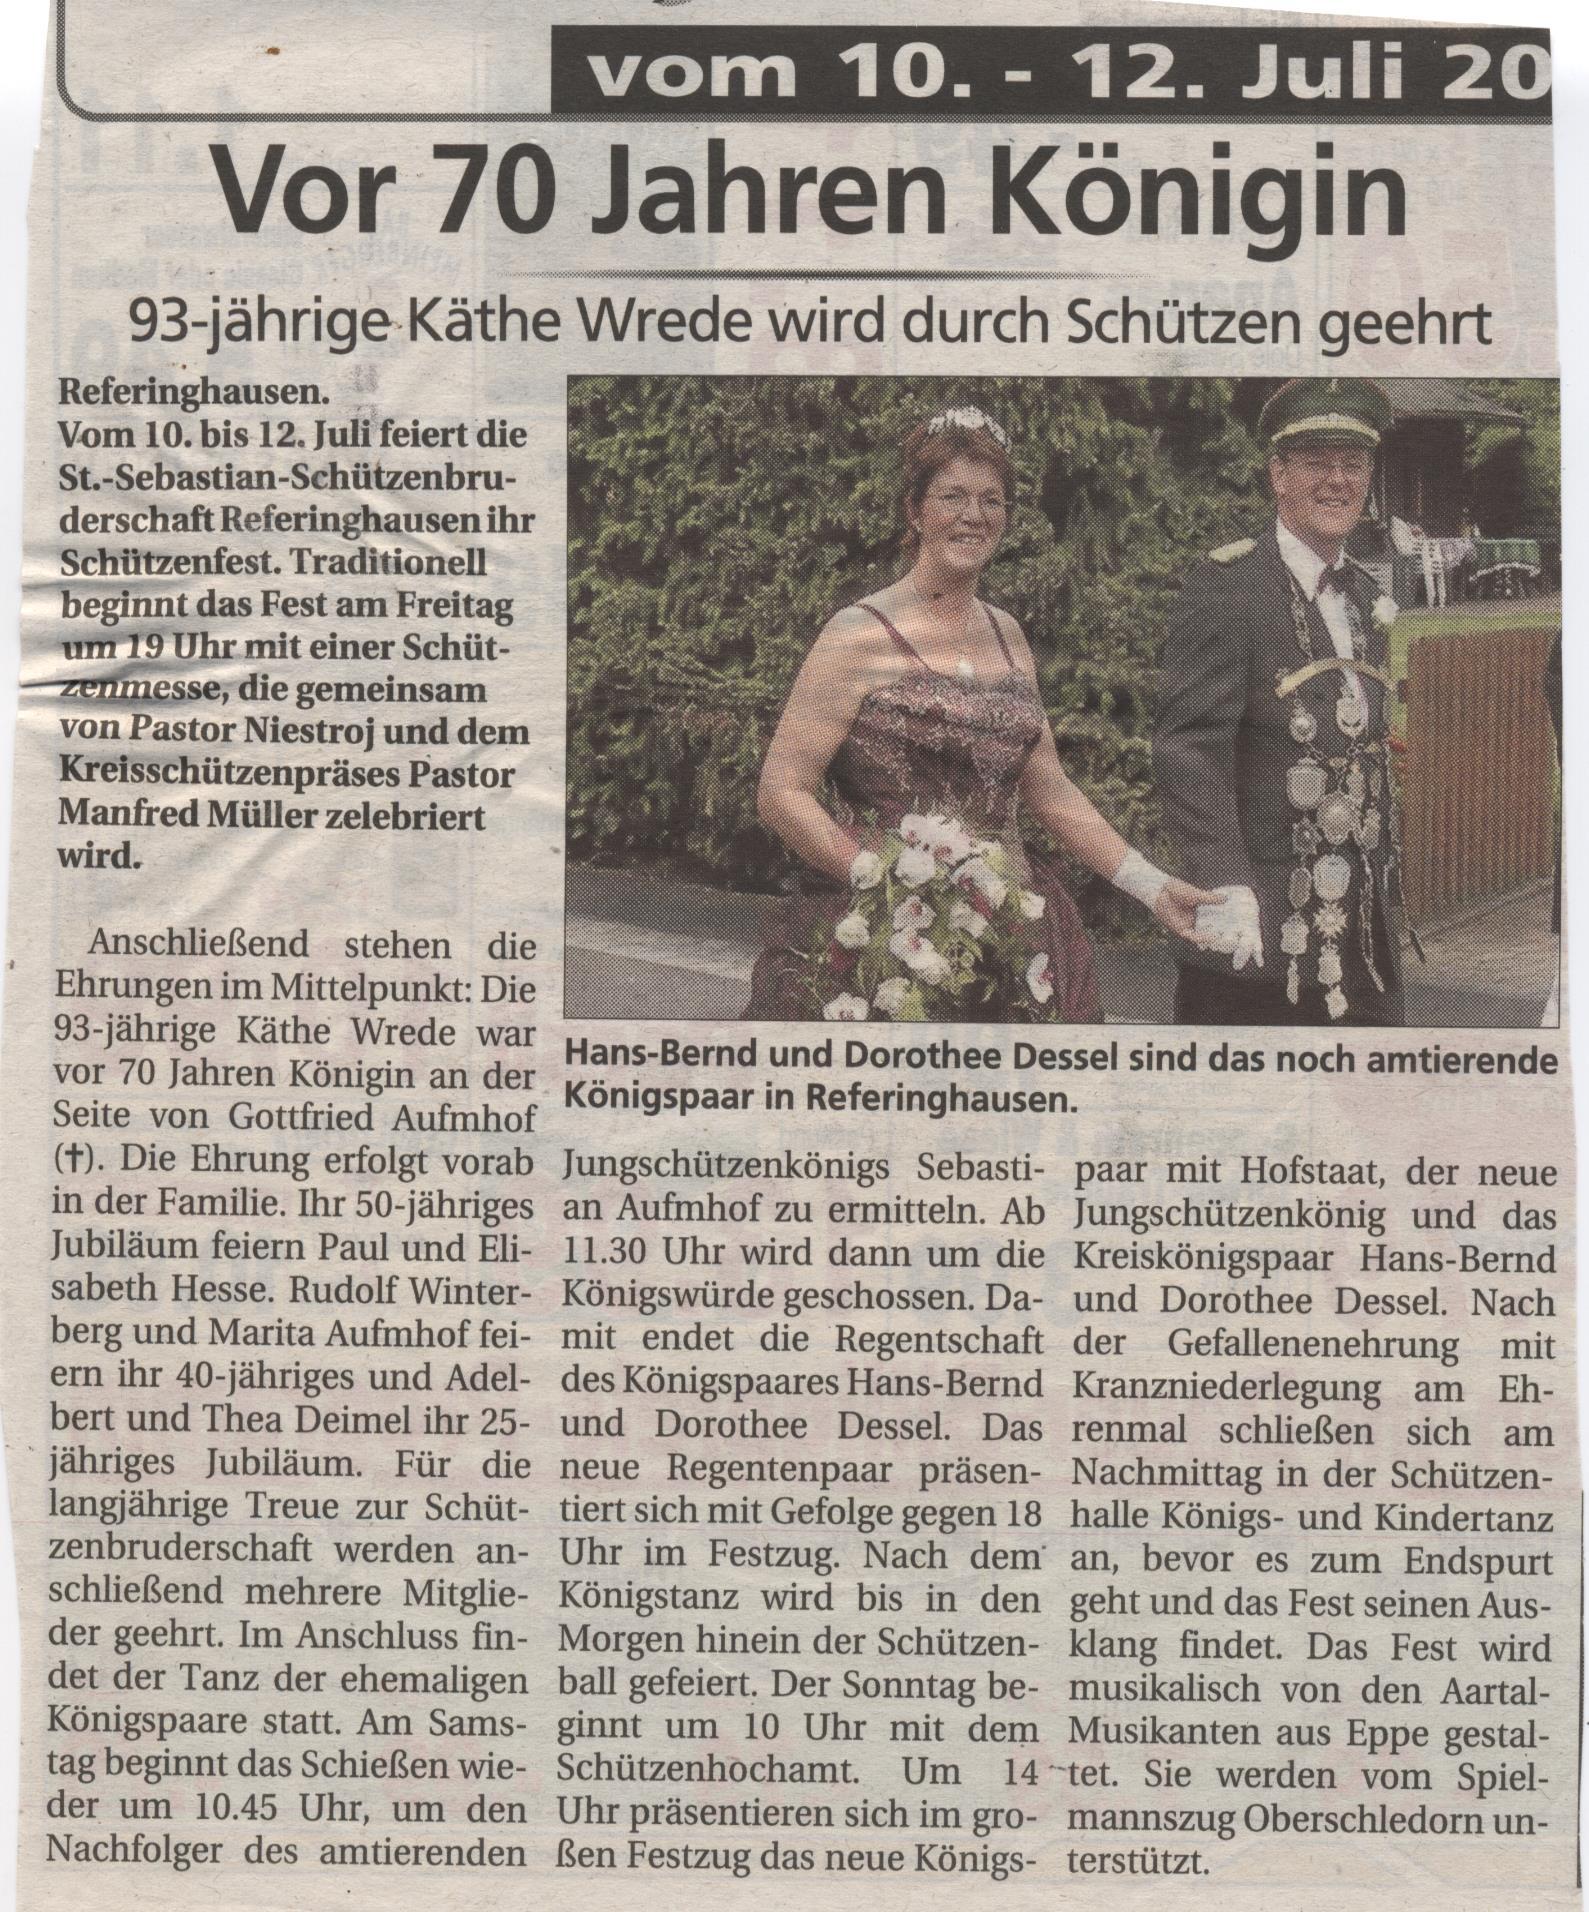 Schützenkönigspaar Hans-Bernd und Dorothee